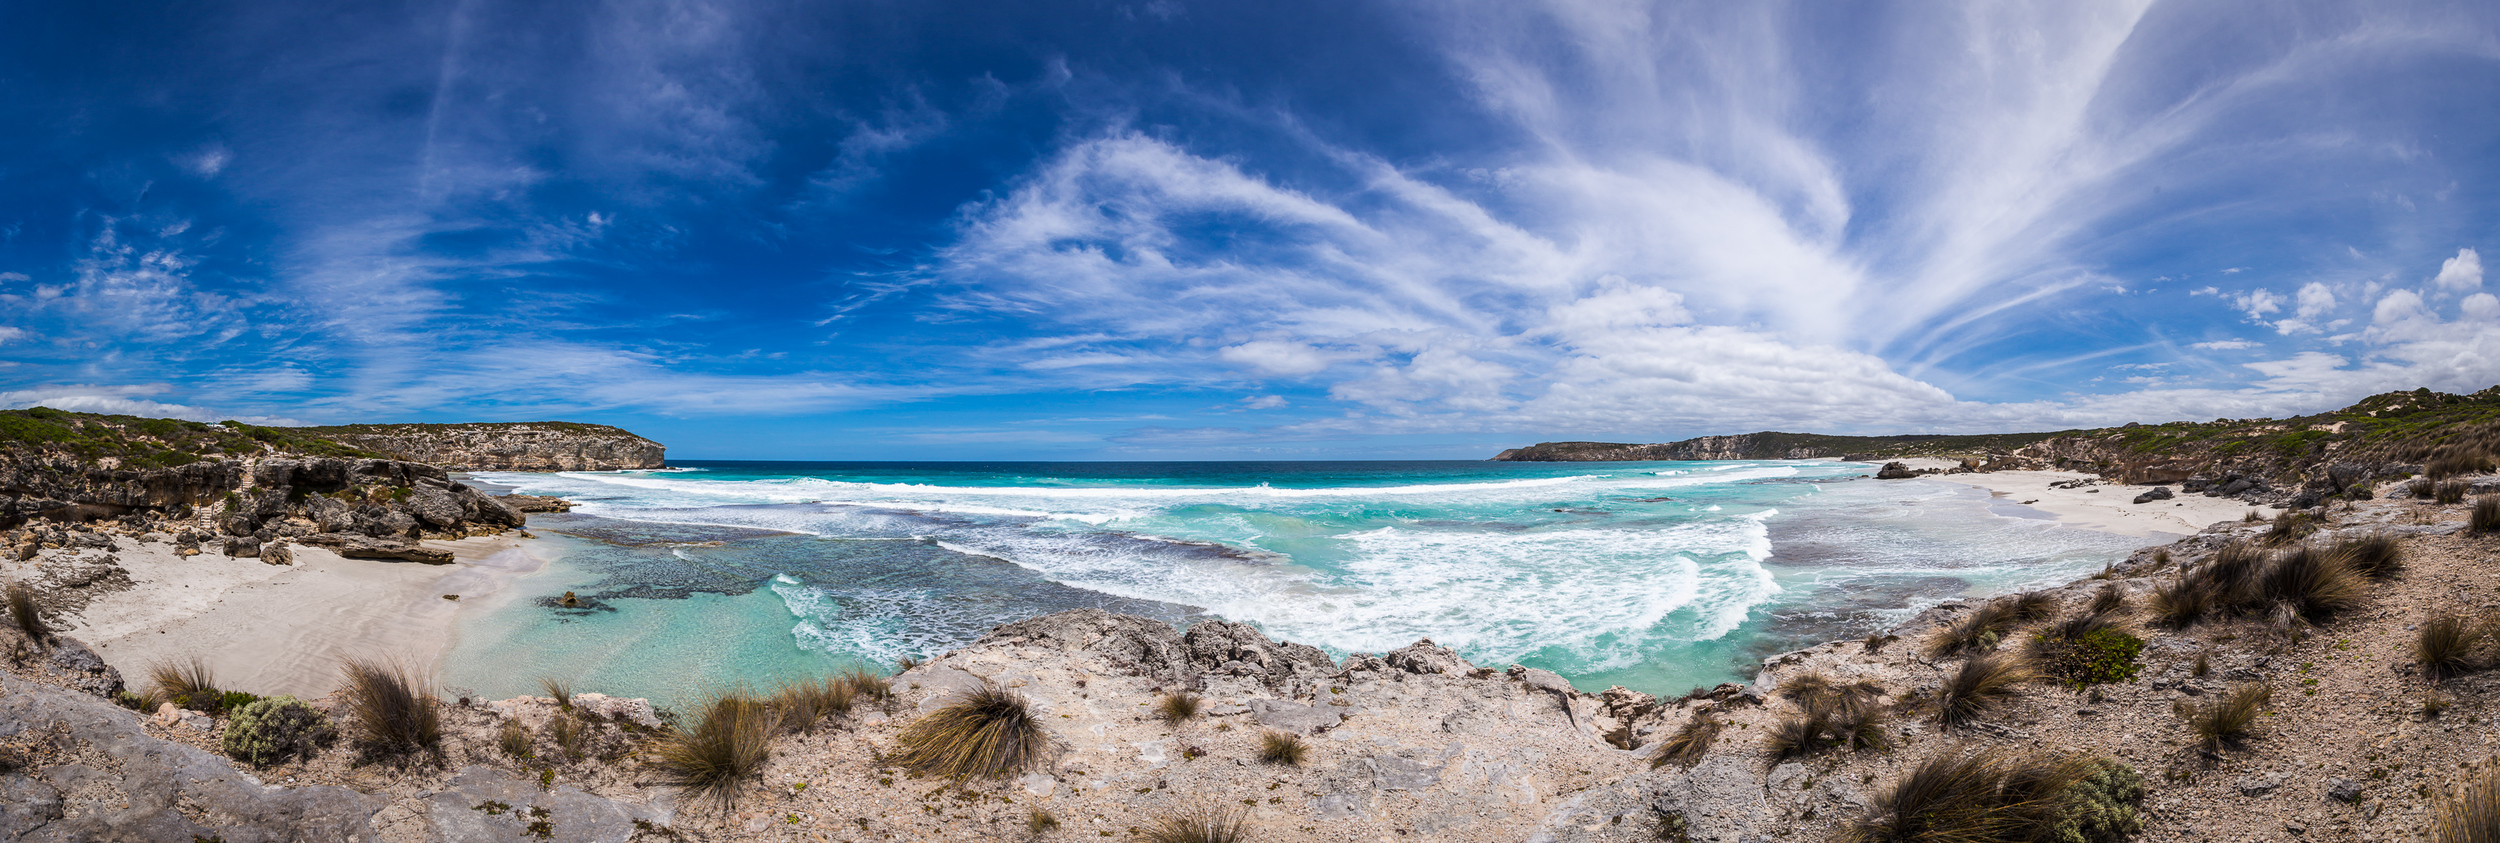 kangaroo_island_20141224_12.jpg